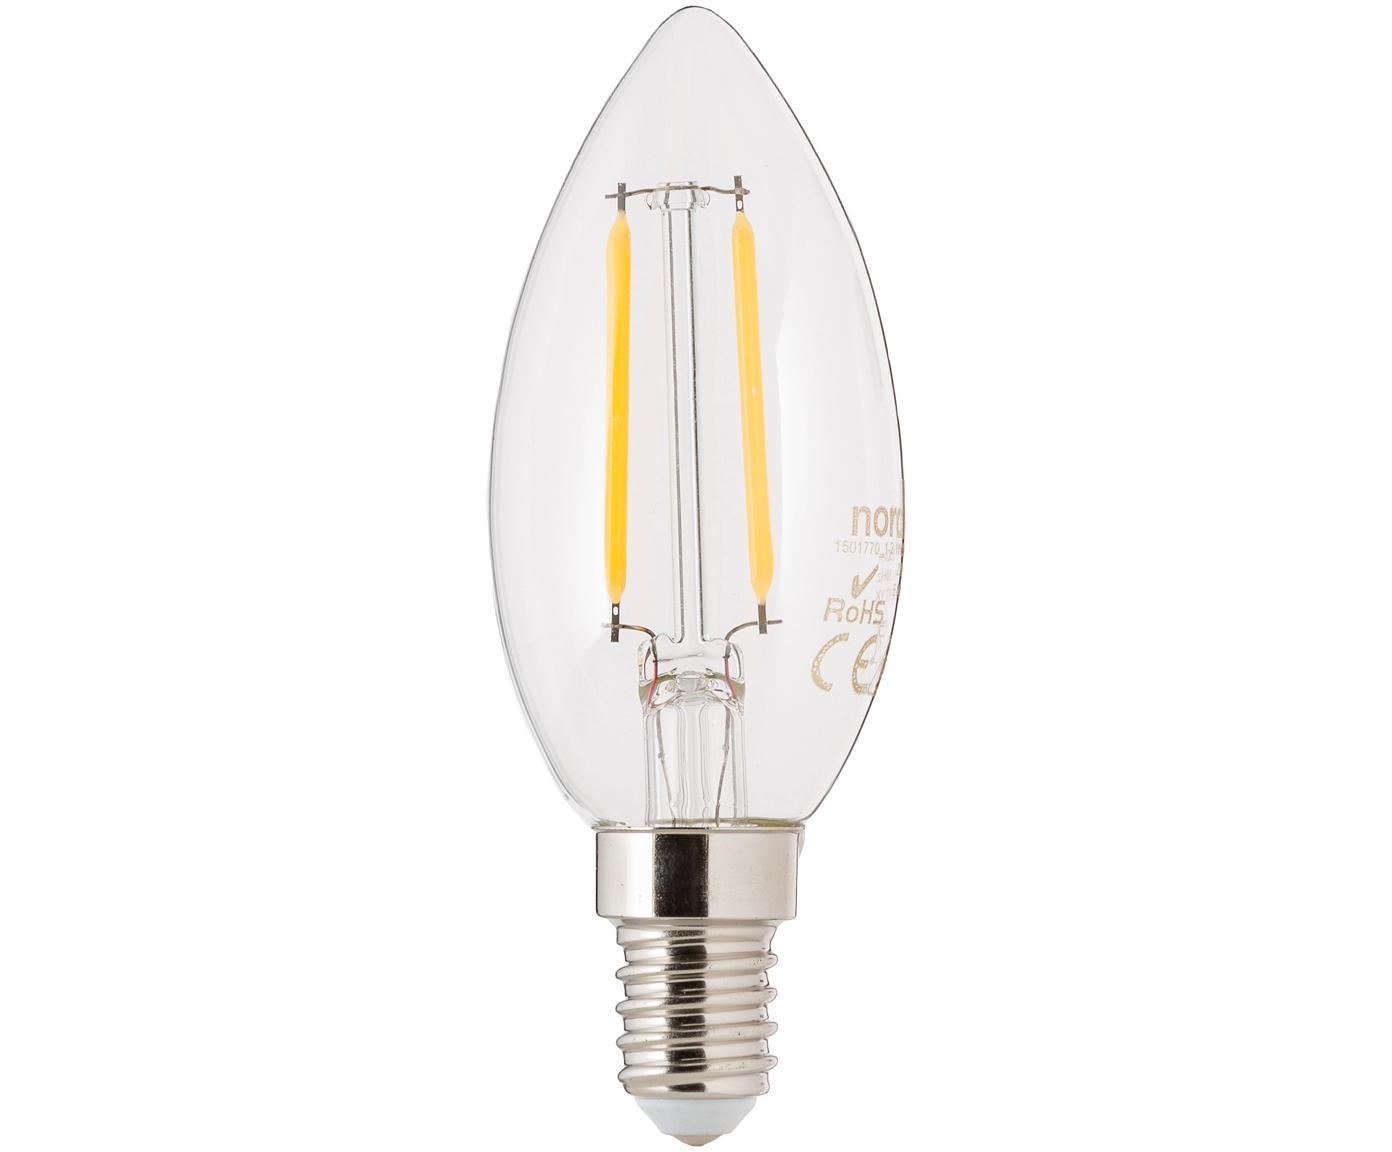 Lampadina a LED Vel (E14 / 2Watt), Lampadina: vetro, Trasparente, Ø 4 x Alt. 10 cm